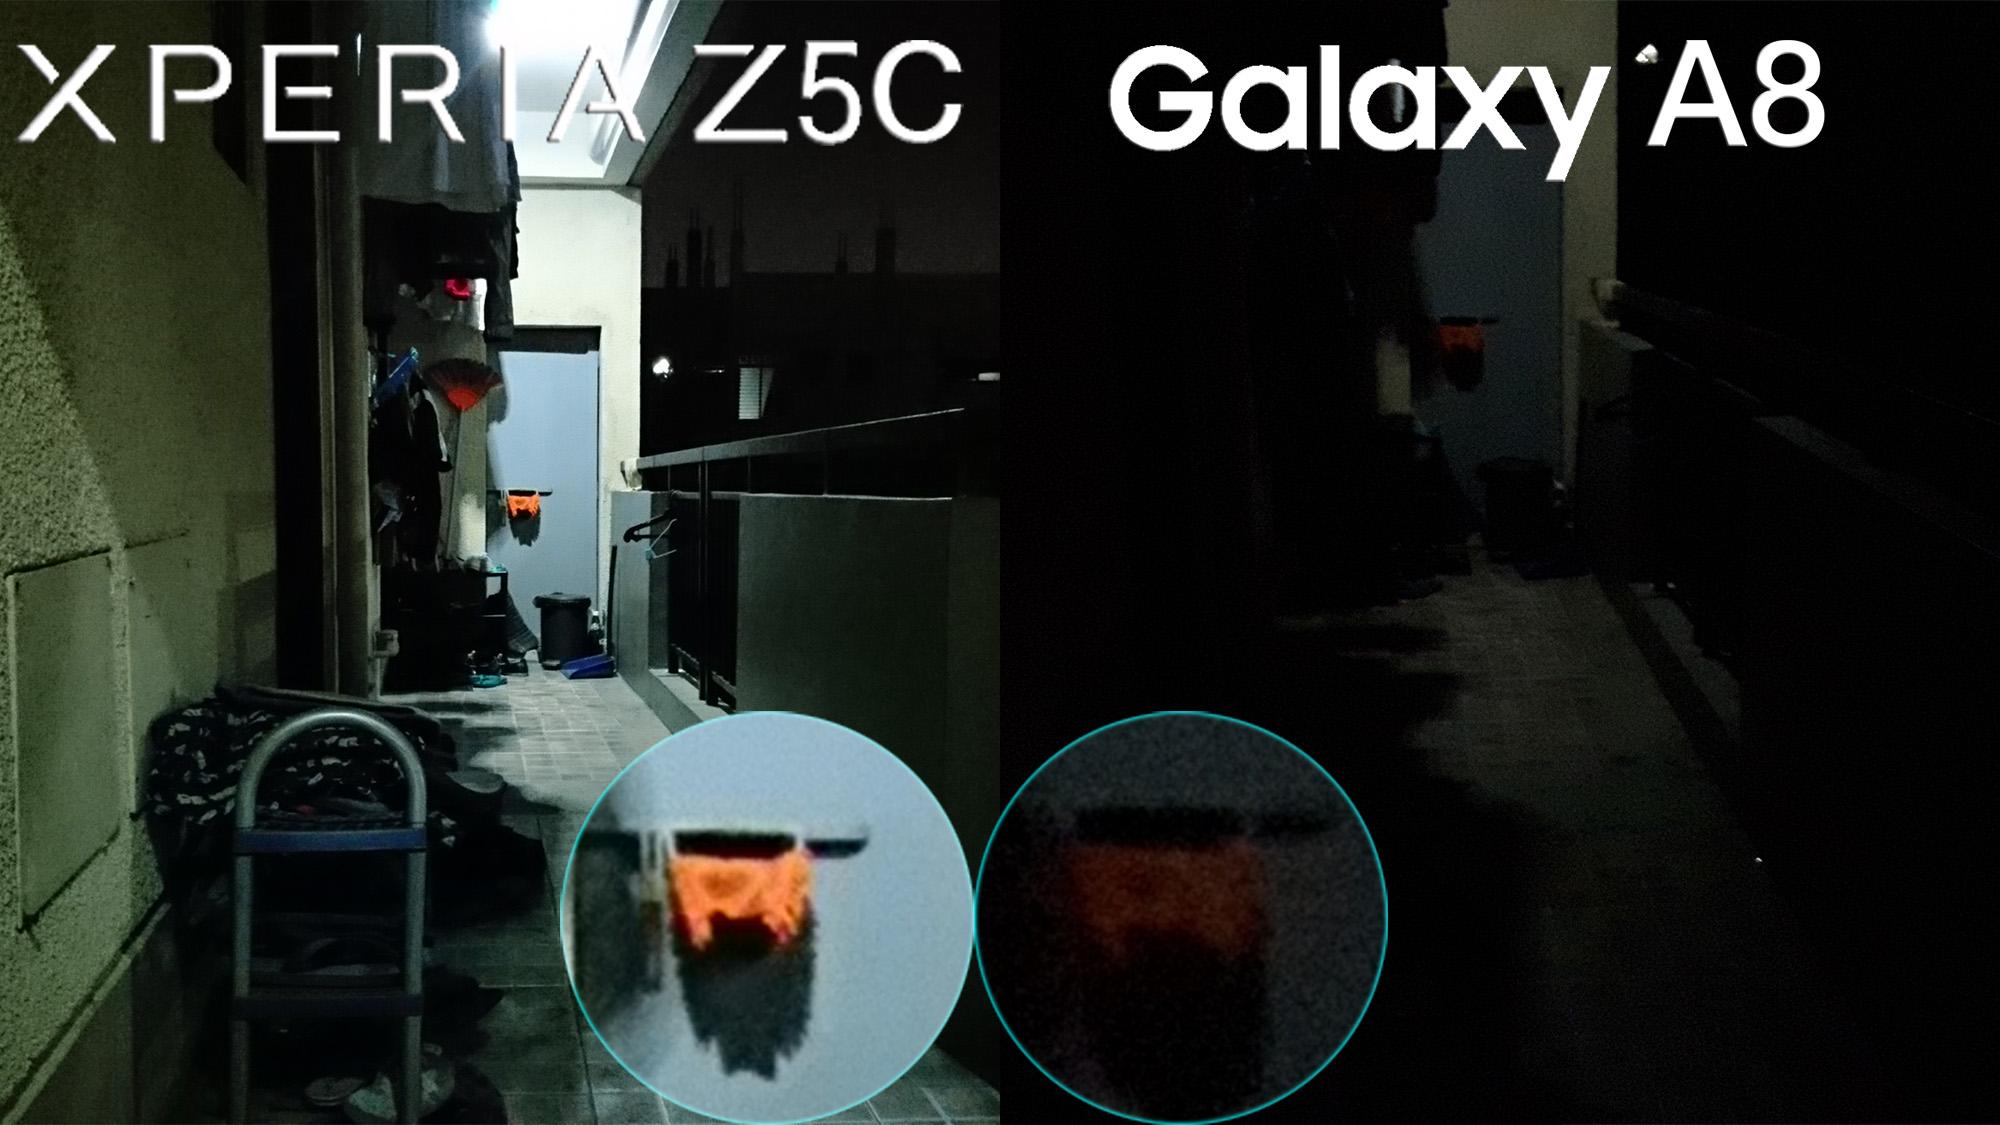 Kindle Vs Sony Reader: Samsung Galaxy A8 VS Sony Xperia Z5 Compact Comparison